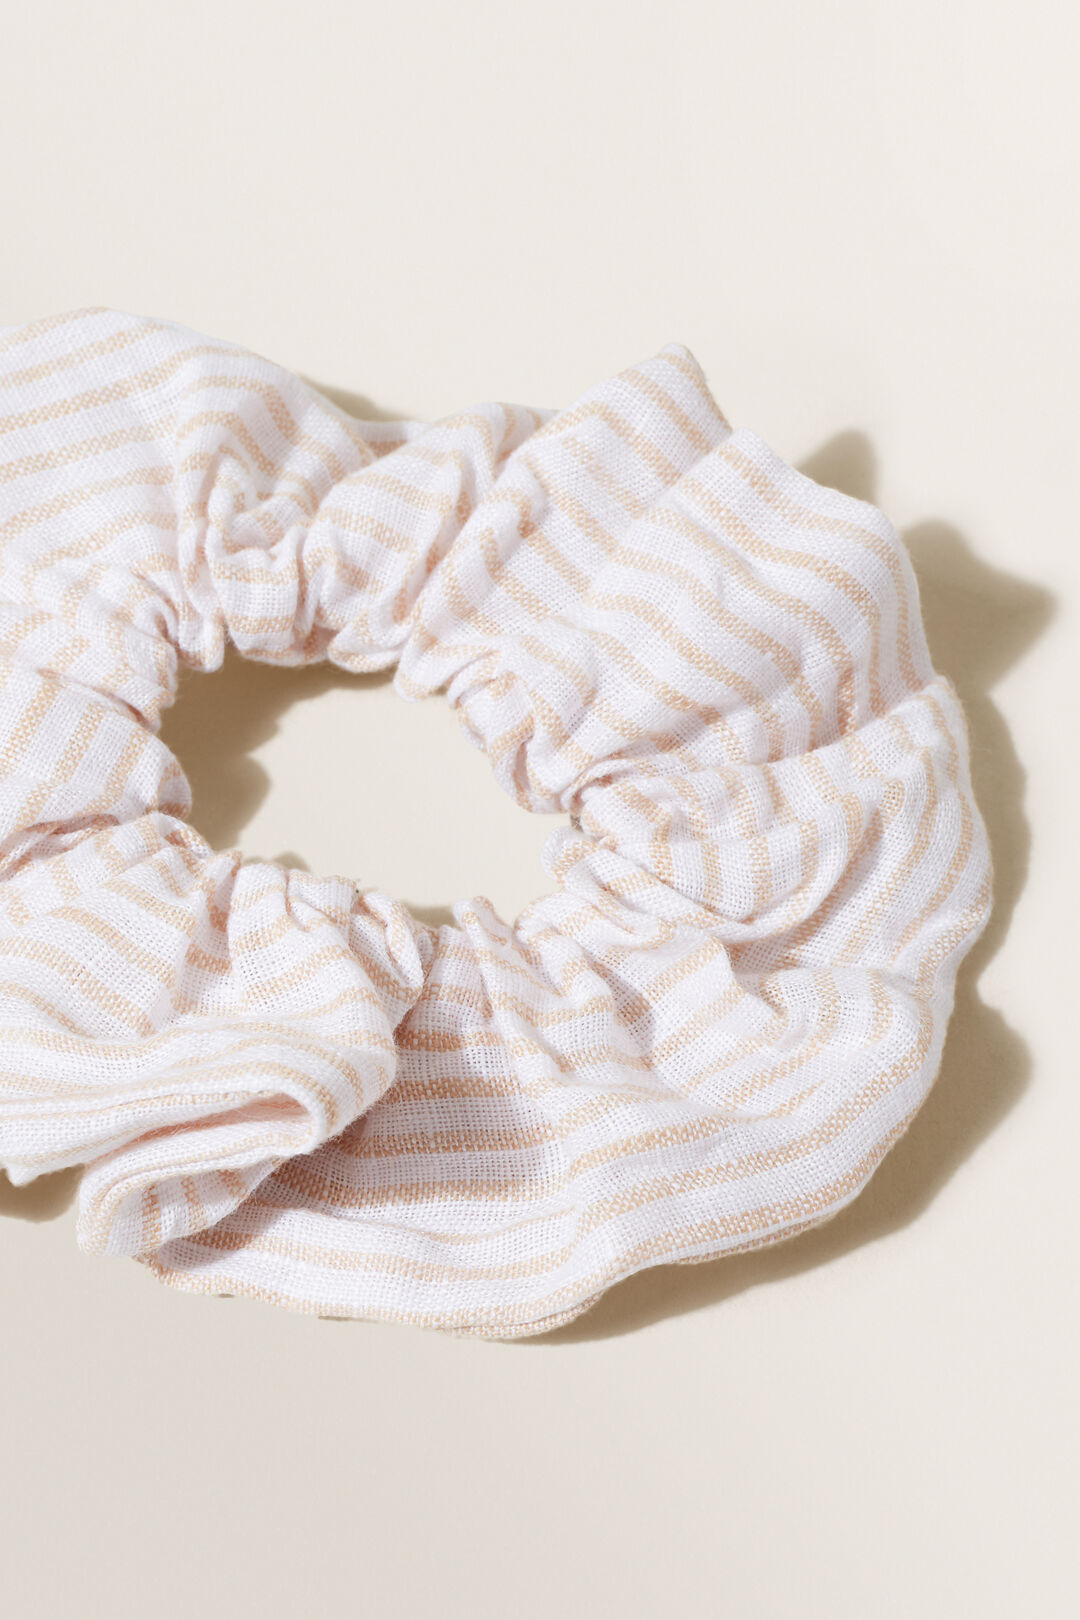 Stripe Linen Scrunchie  NEUTRAL SAND STRIPE  hi-res